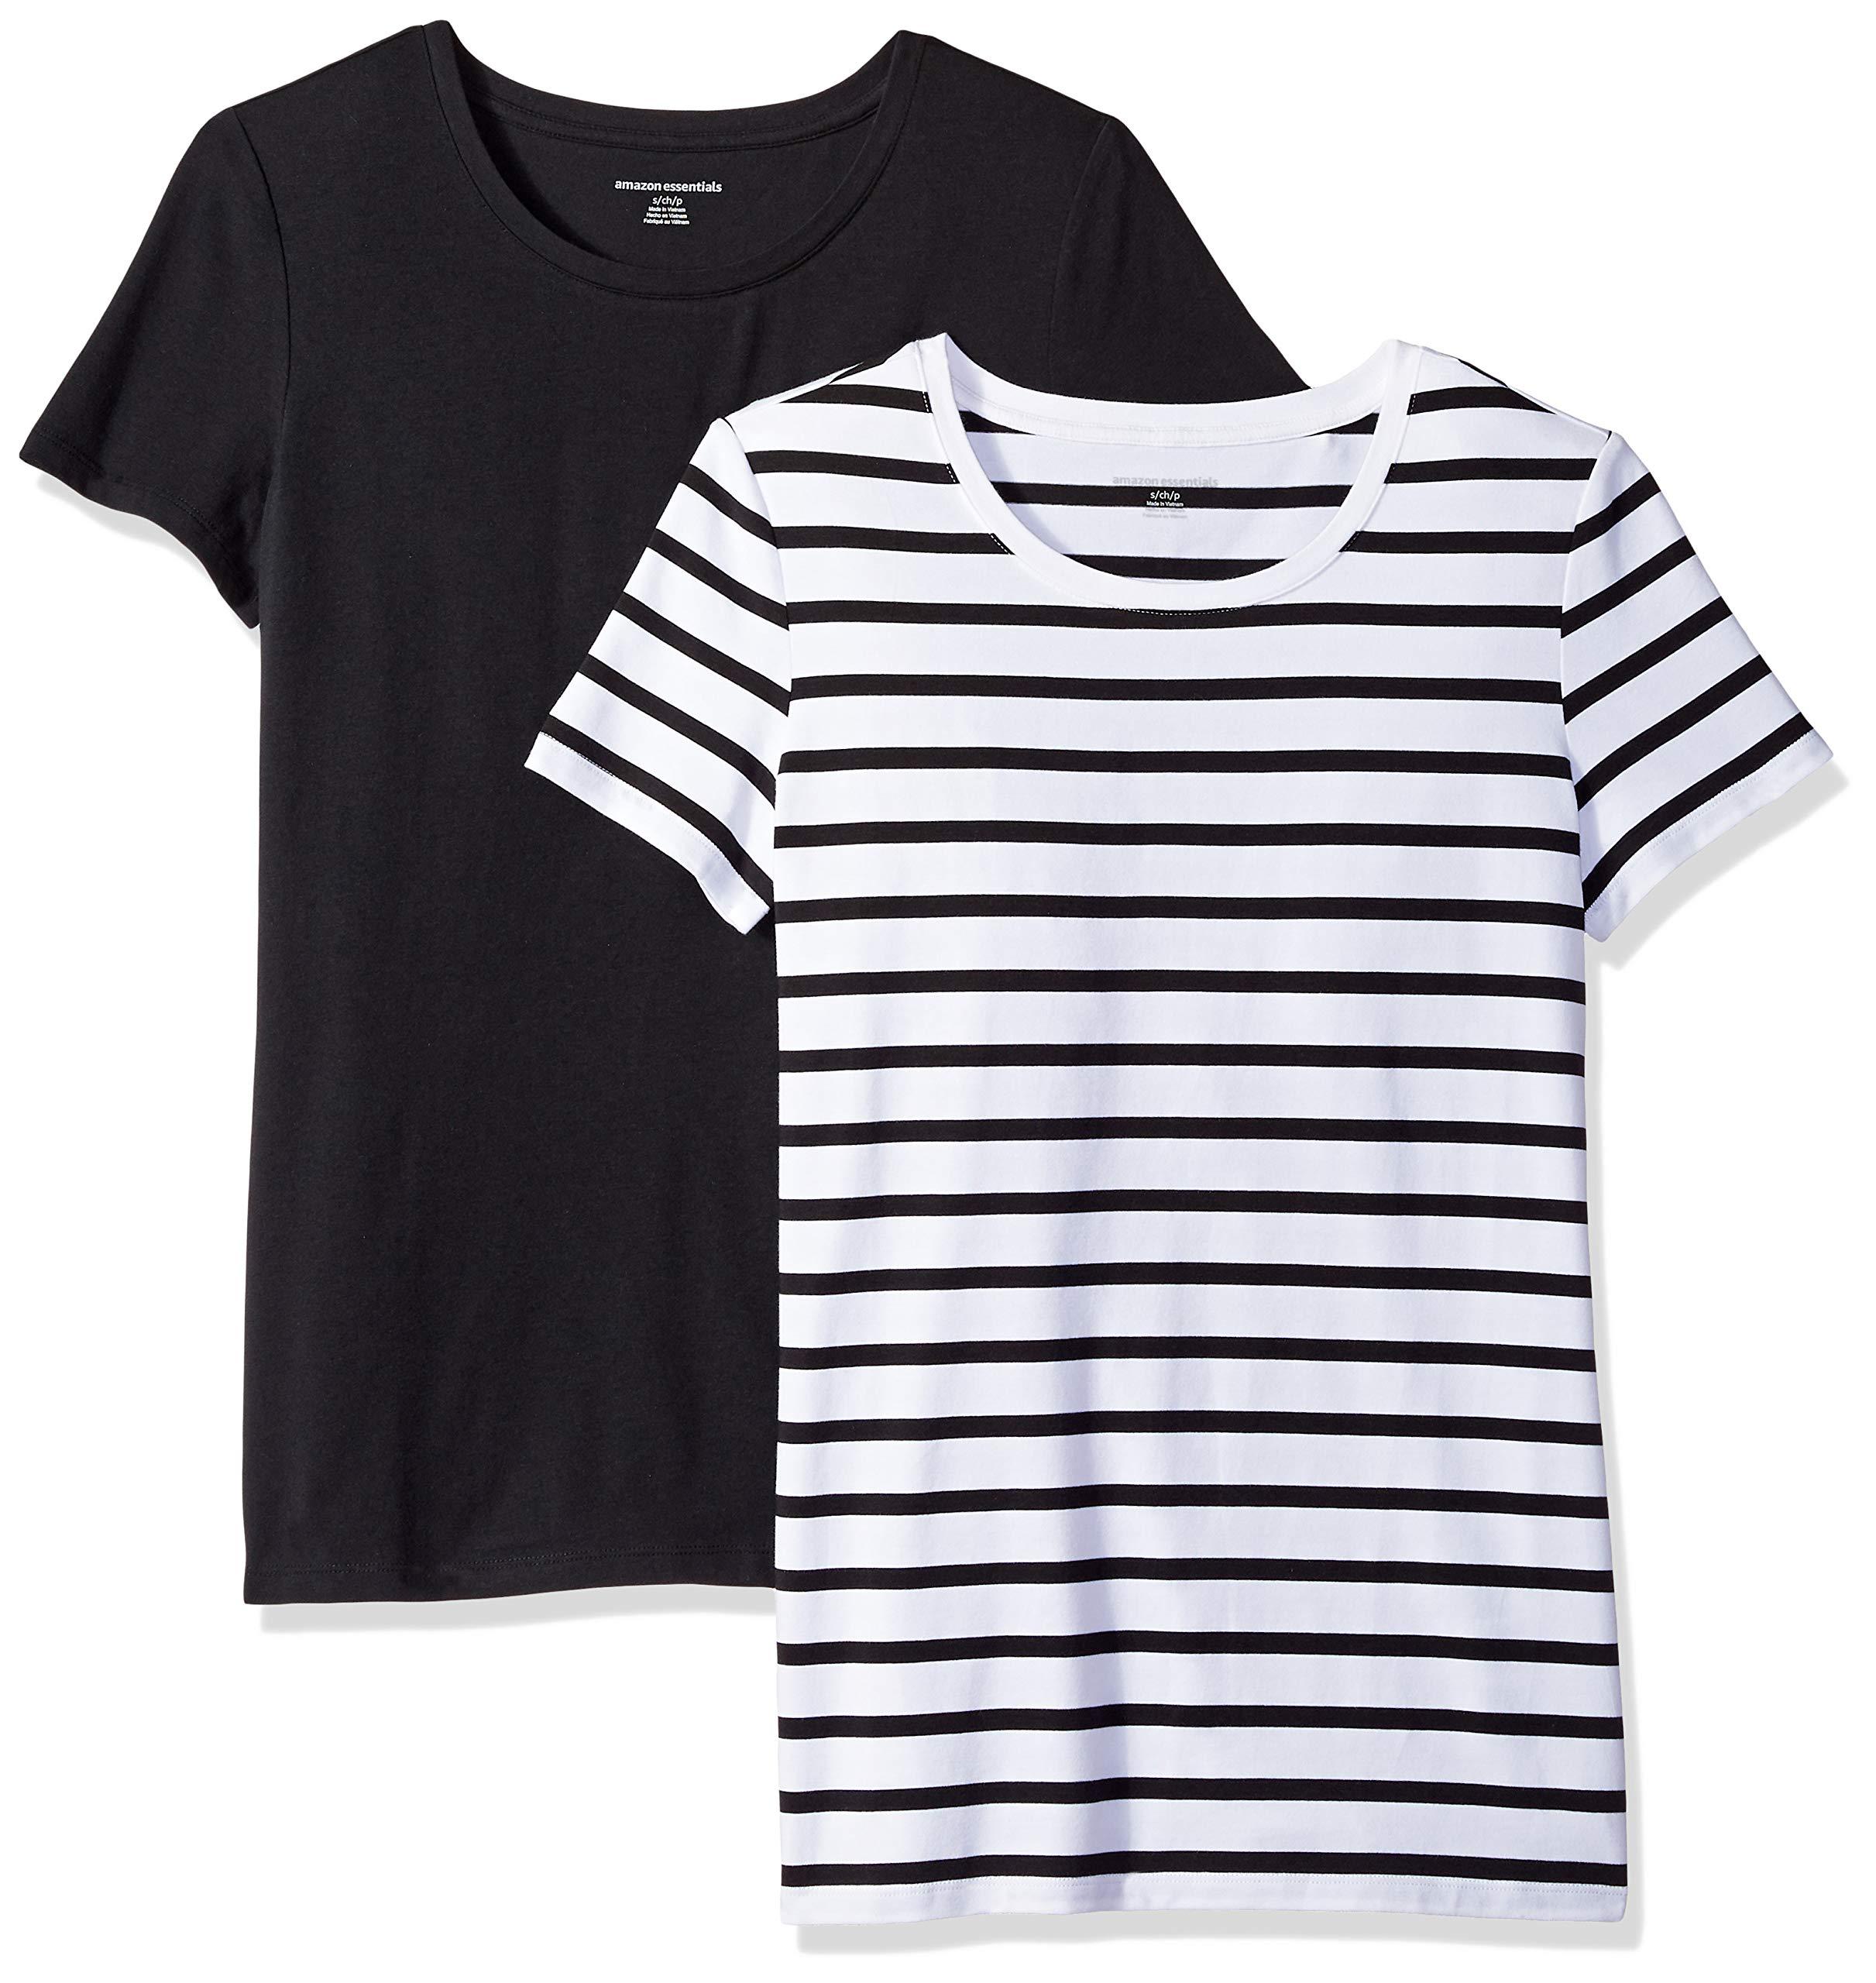 Amazon Essentials Women's 2-Pack Short-Sleeve Crewneck T-Shirt, White Mariner Stripe/Black, Medium